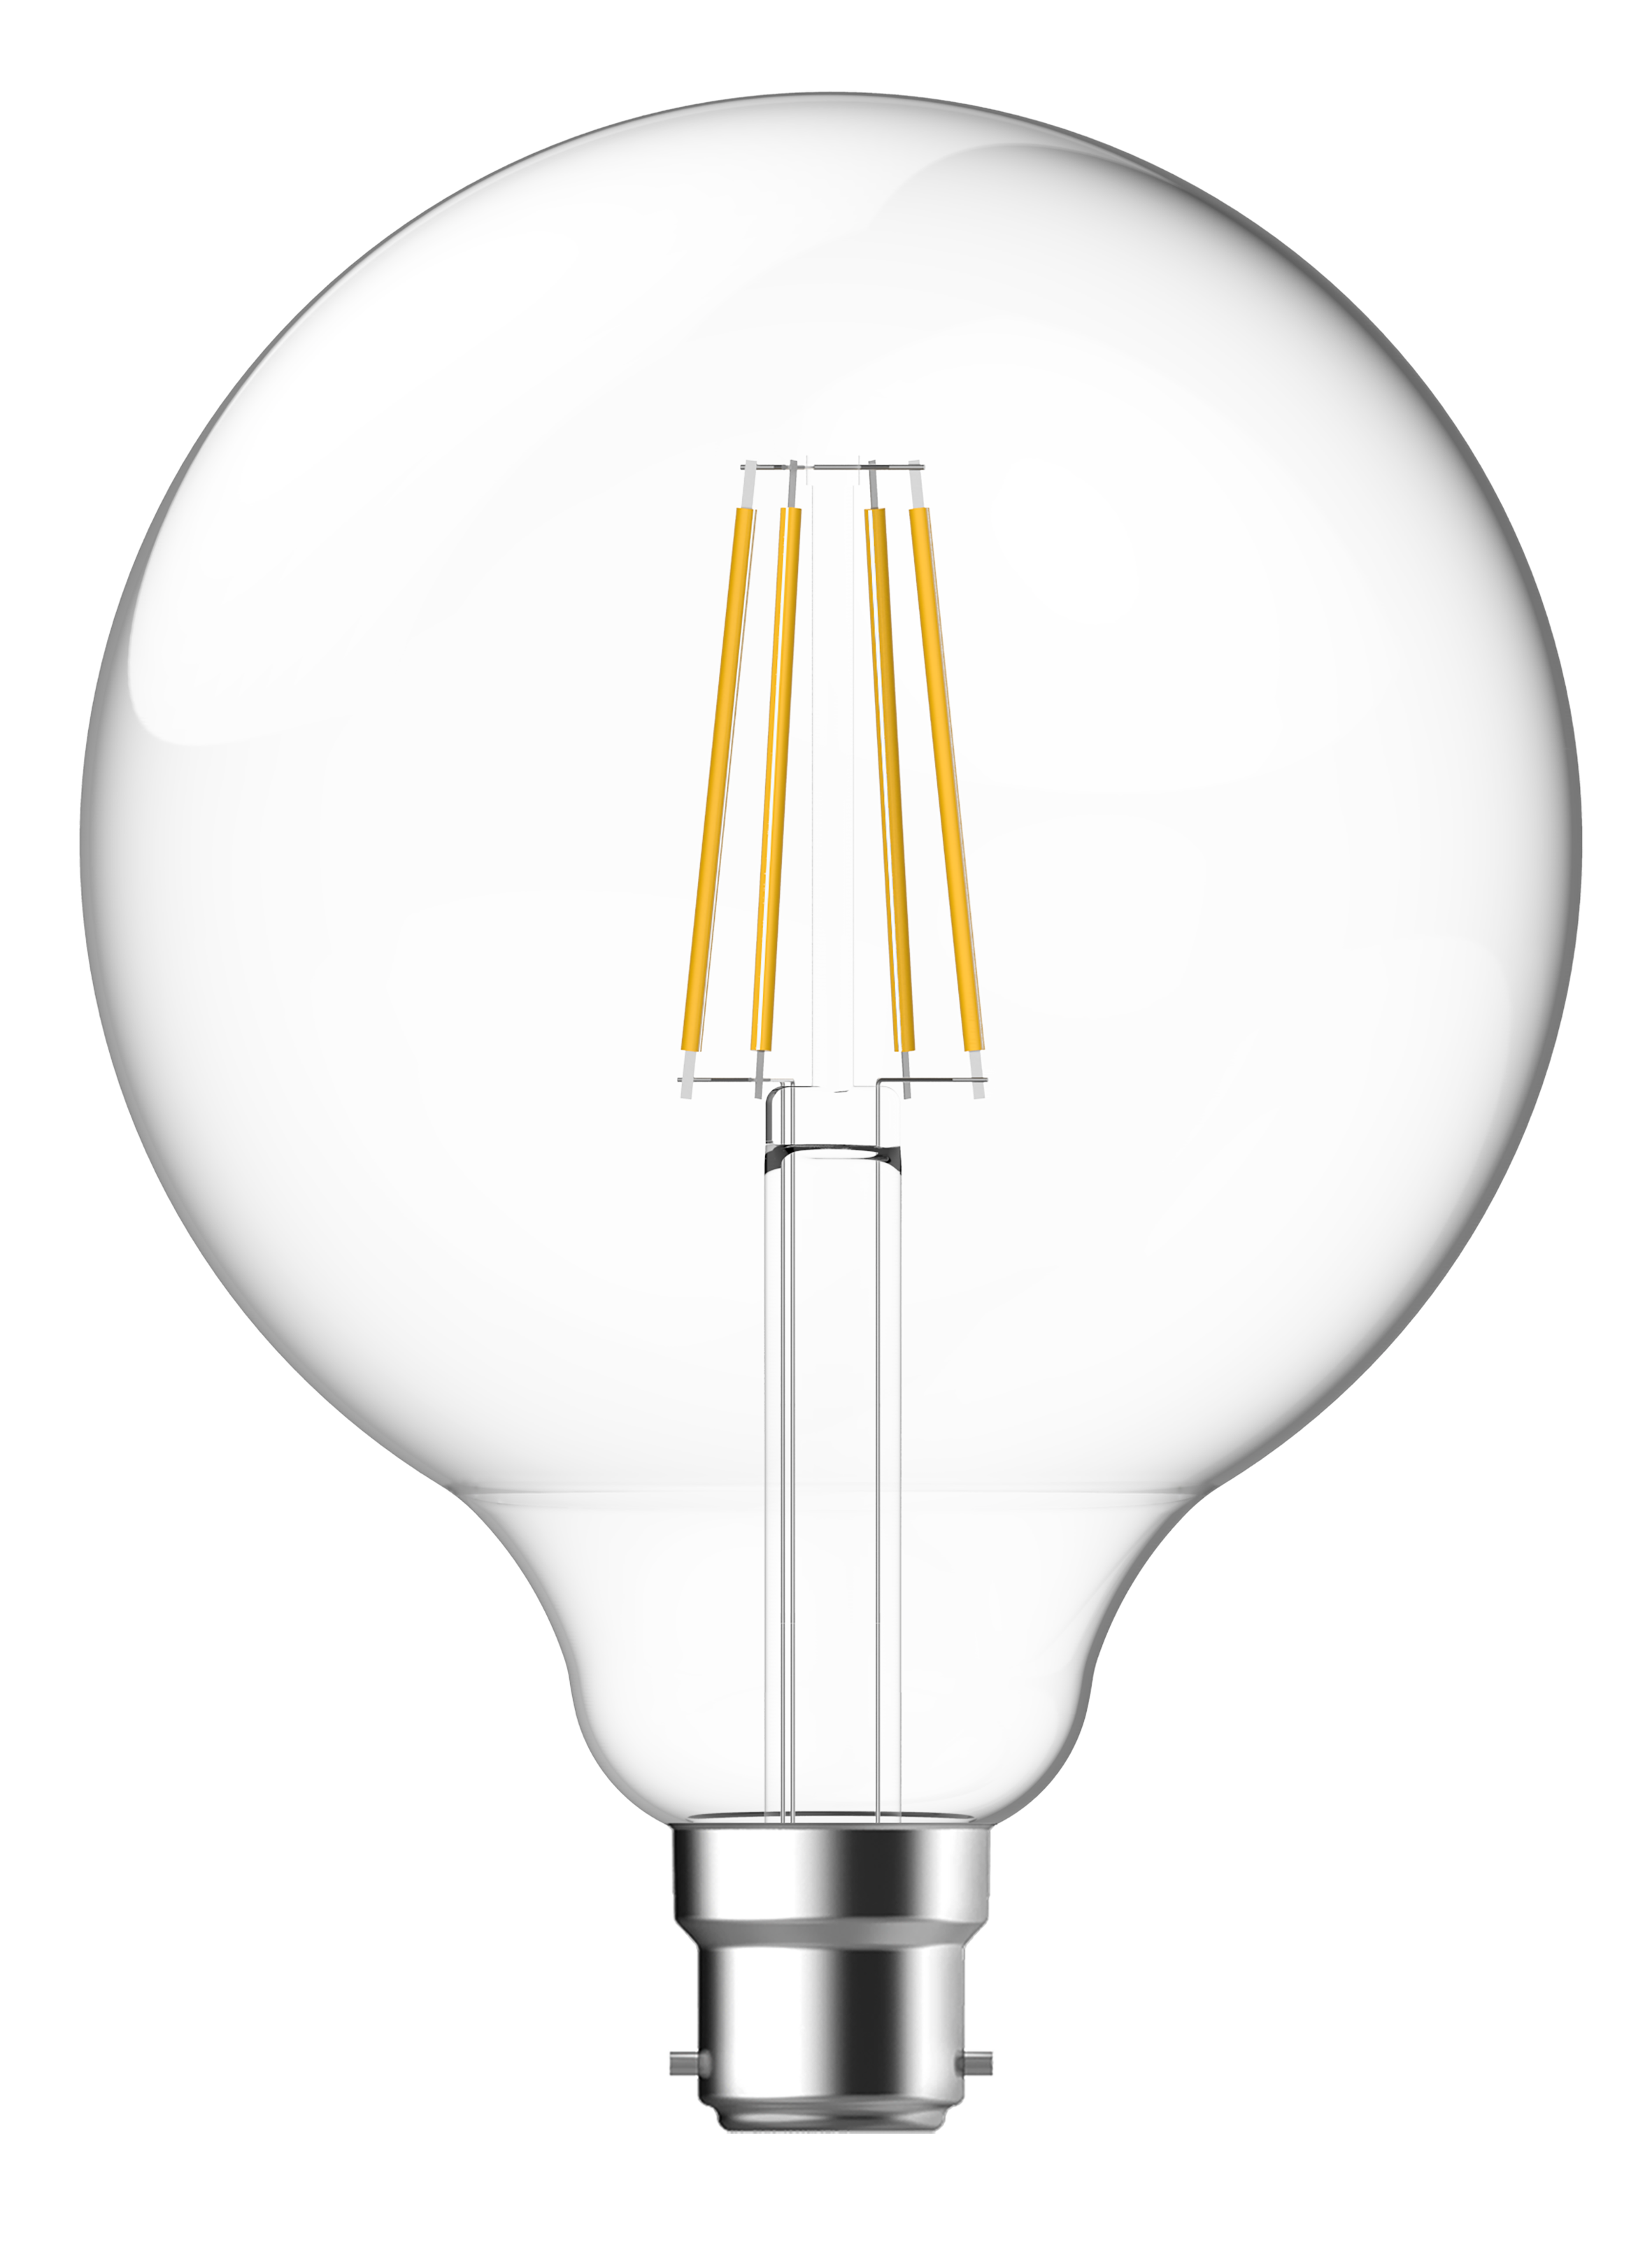 SupValue G125 LED Filament Globe